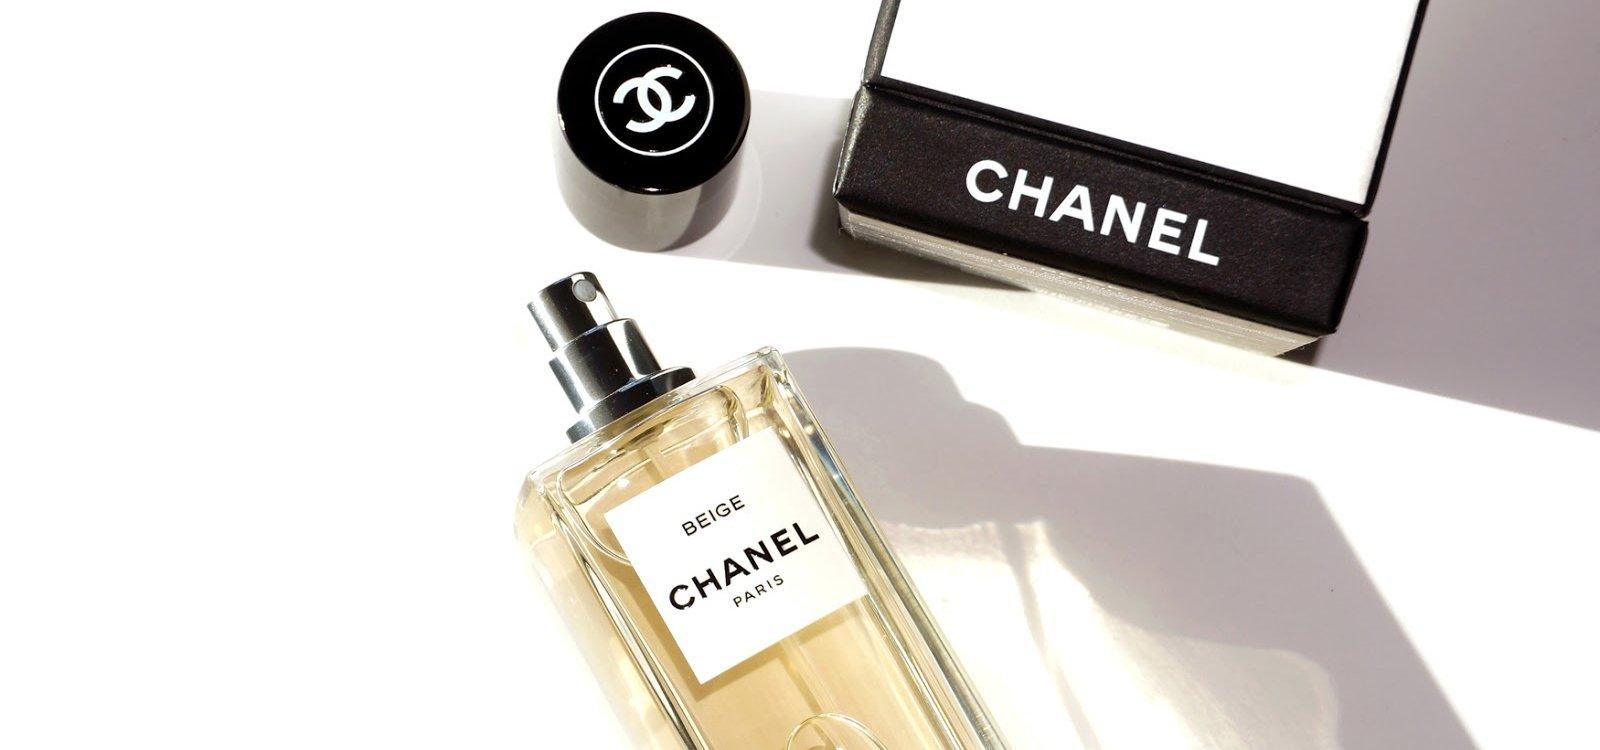 Chanel Boy, un perfume masculino apto para mujeres